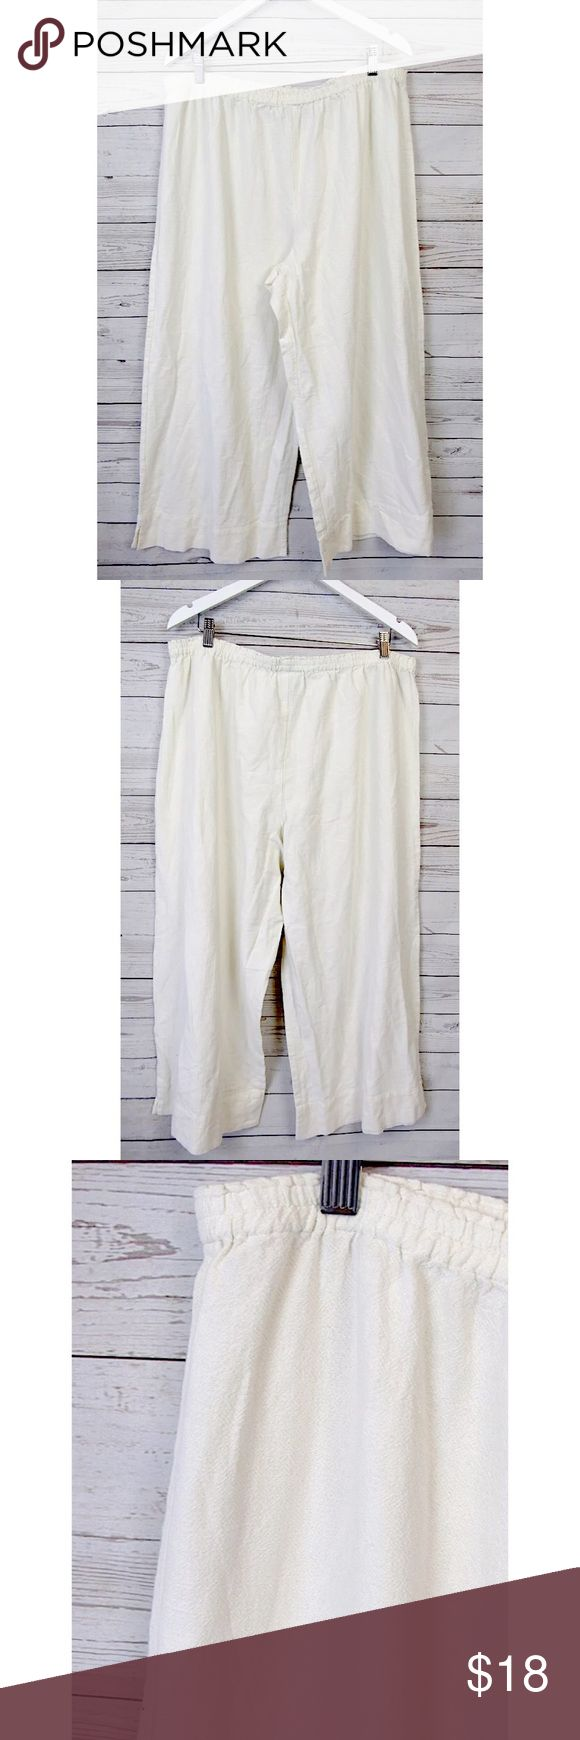 "Soft Surrounding Ivory Gauzy Beach Pants Sz 2X Brand: Soft Surroundings Style:  Beach pants, elastic waist, wide legs Size:  2X Color/Pattern:  ivory Material:  100% cotton Measurements taken flat:  -Waist:   19"" -Inseam:   28"" -Rise:   14.5"" -Leg Opening:   16"" Garment Care: machine wash, tumble dry    Condition: No flaws Soft Surroundings Pants Wide Leg"